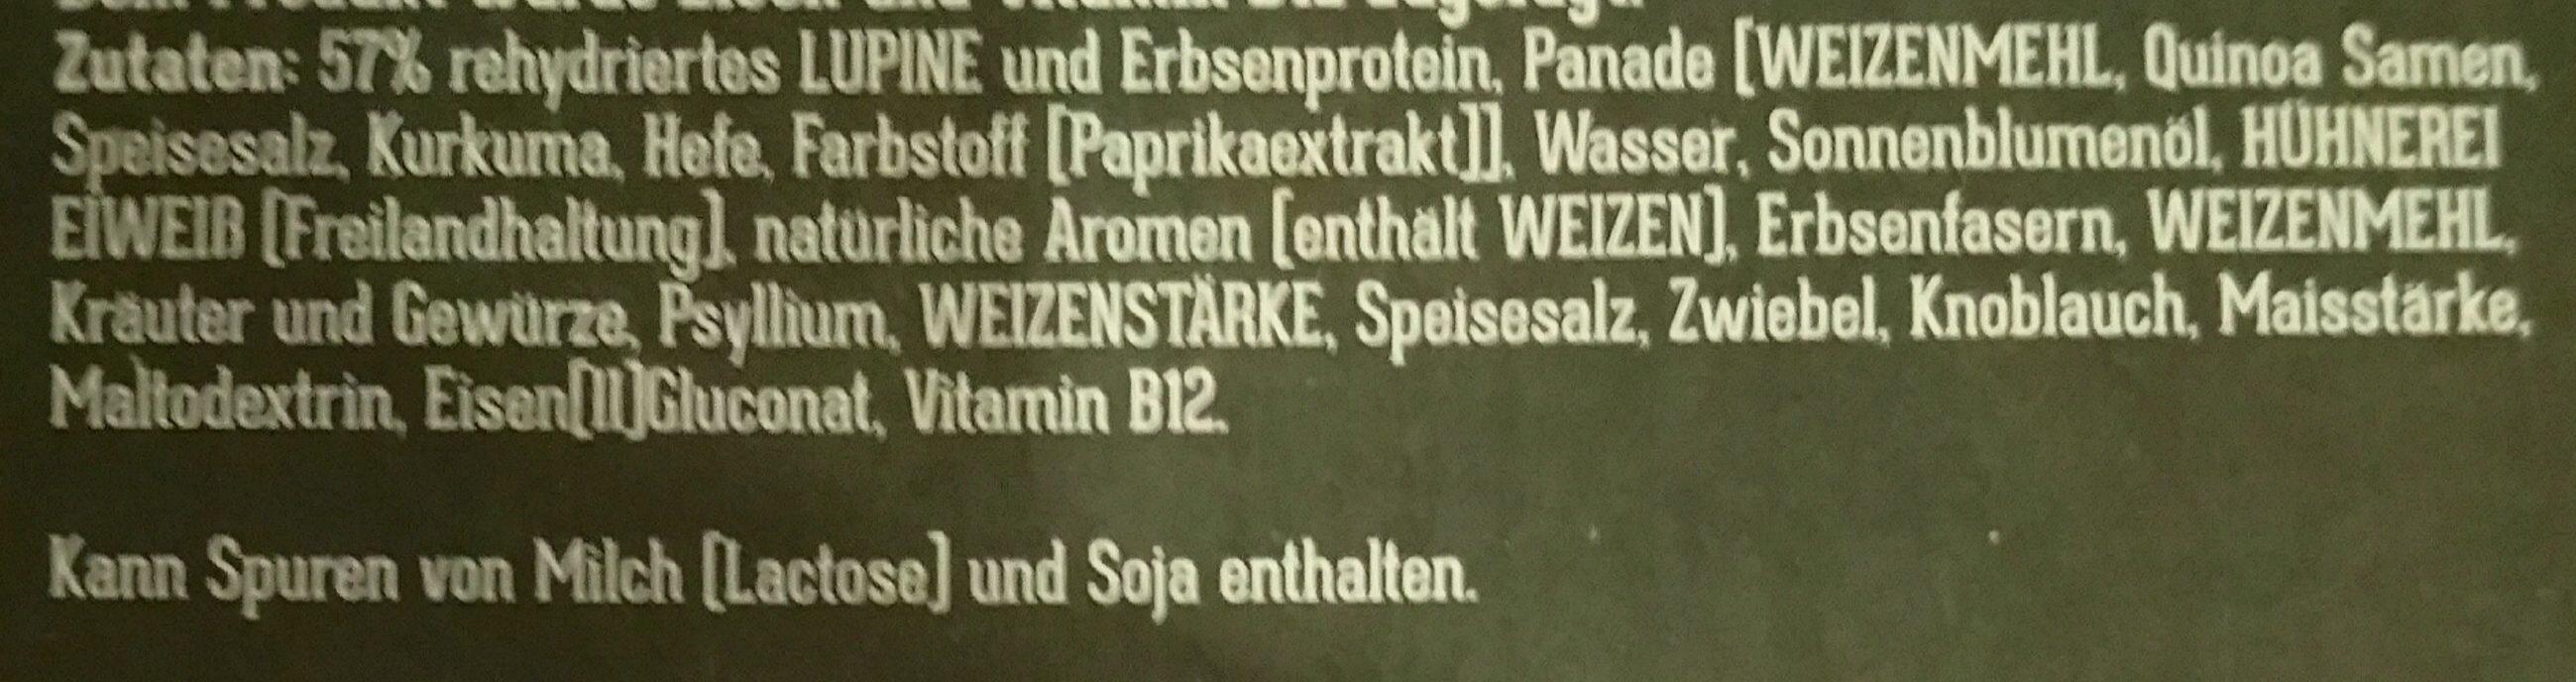 Schitzel - Ingrédients - de